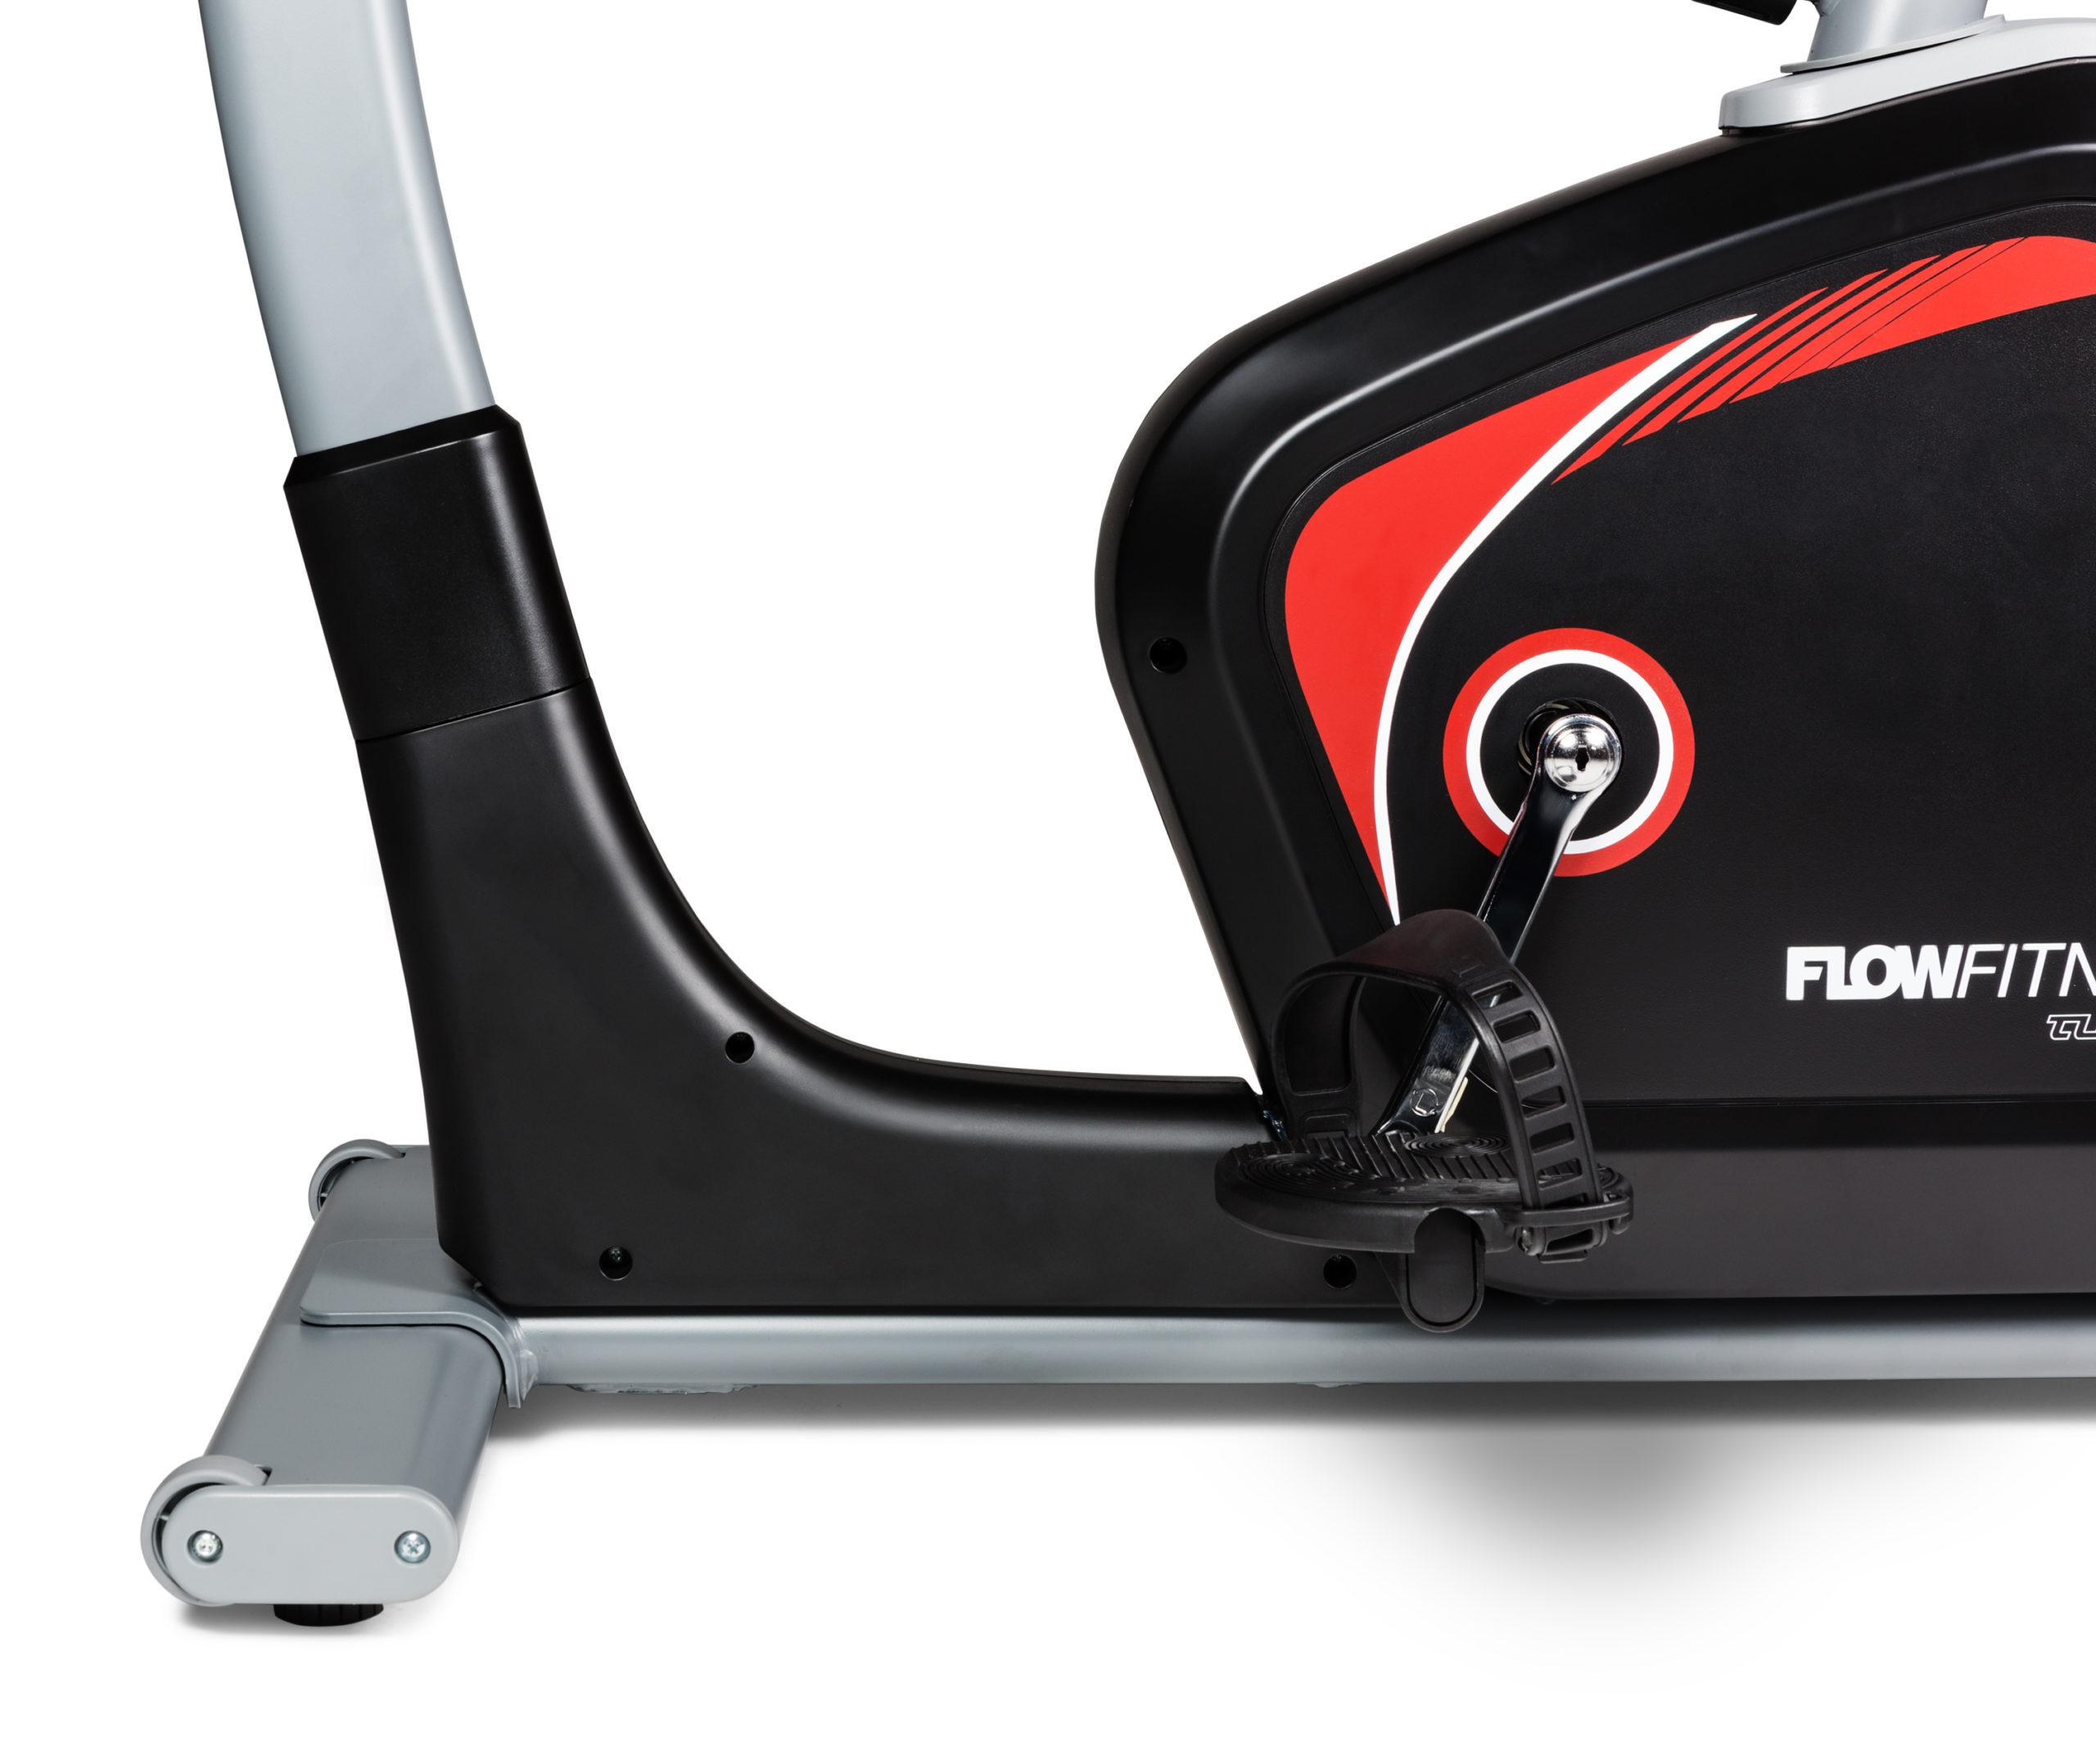 Flow Fitness Tabel Turner DHT2500i Hometrainer 10